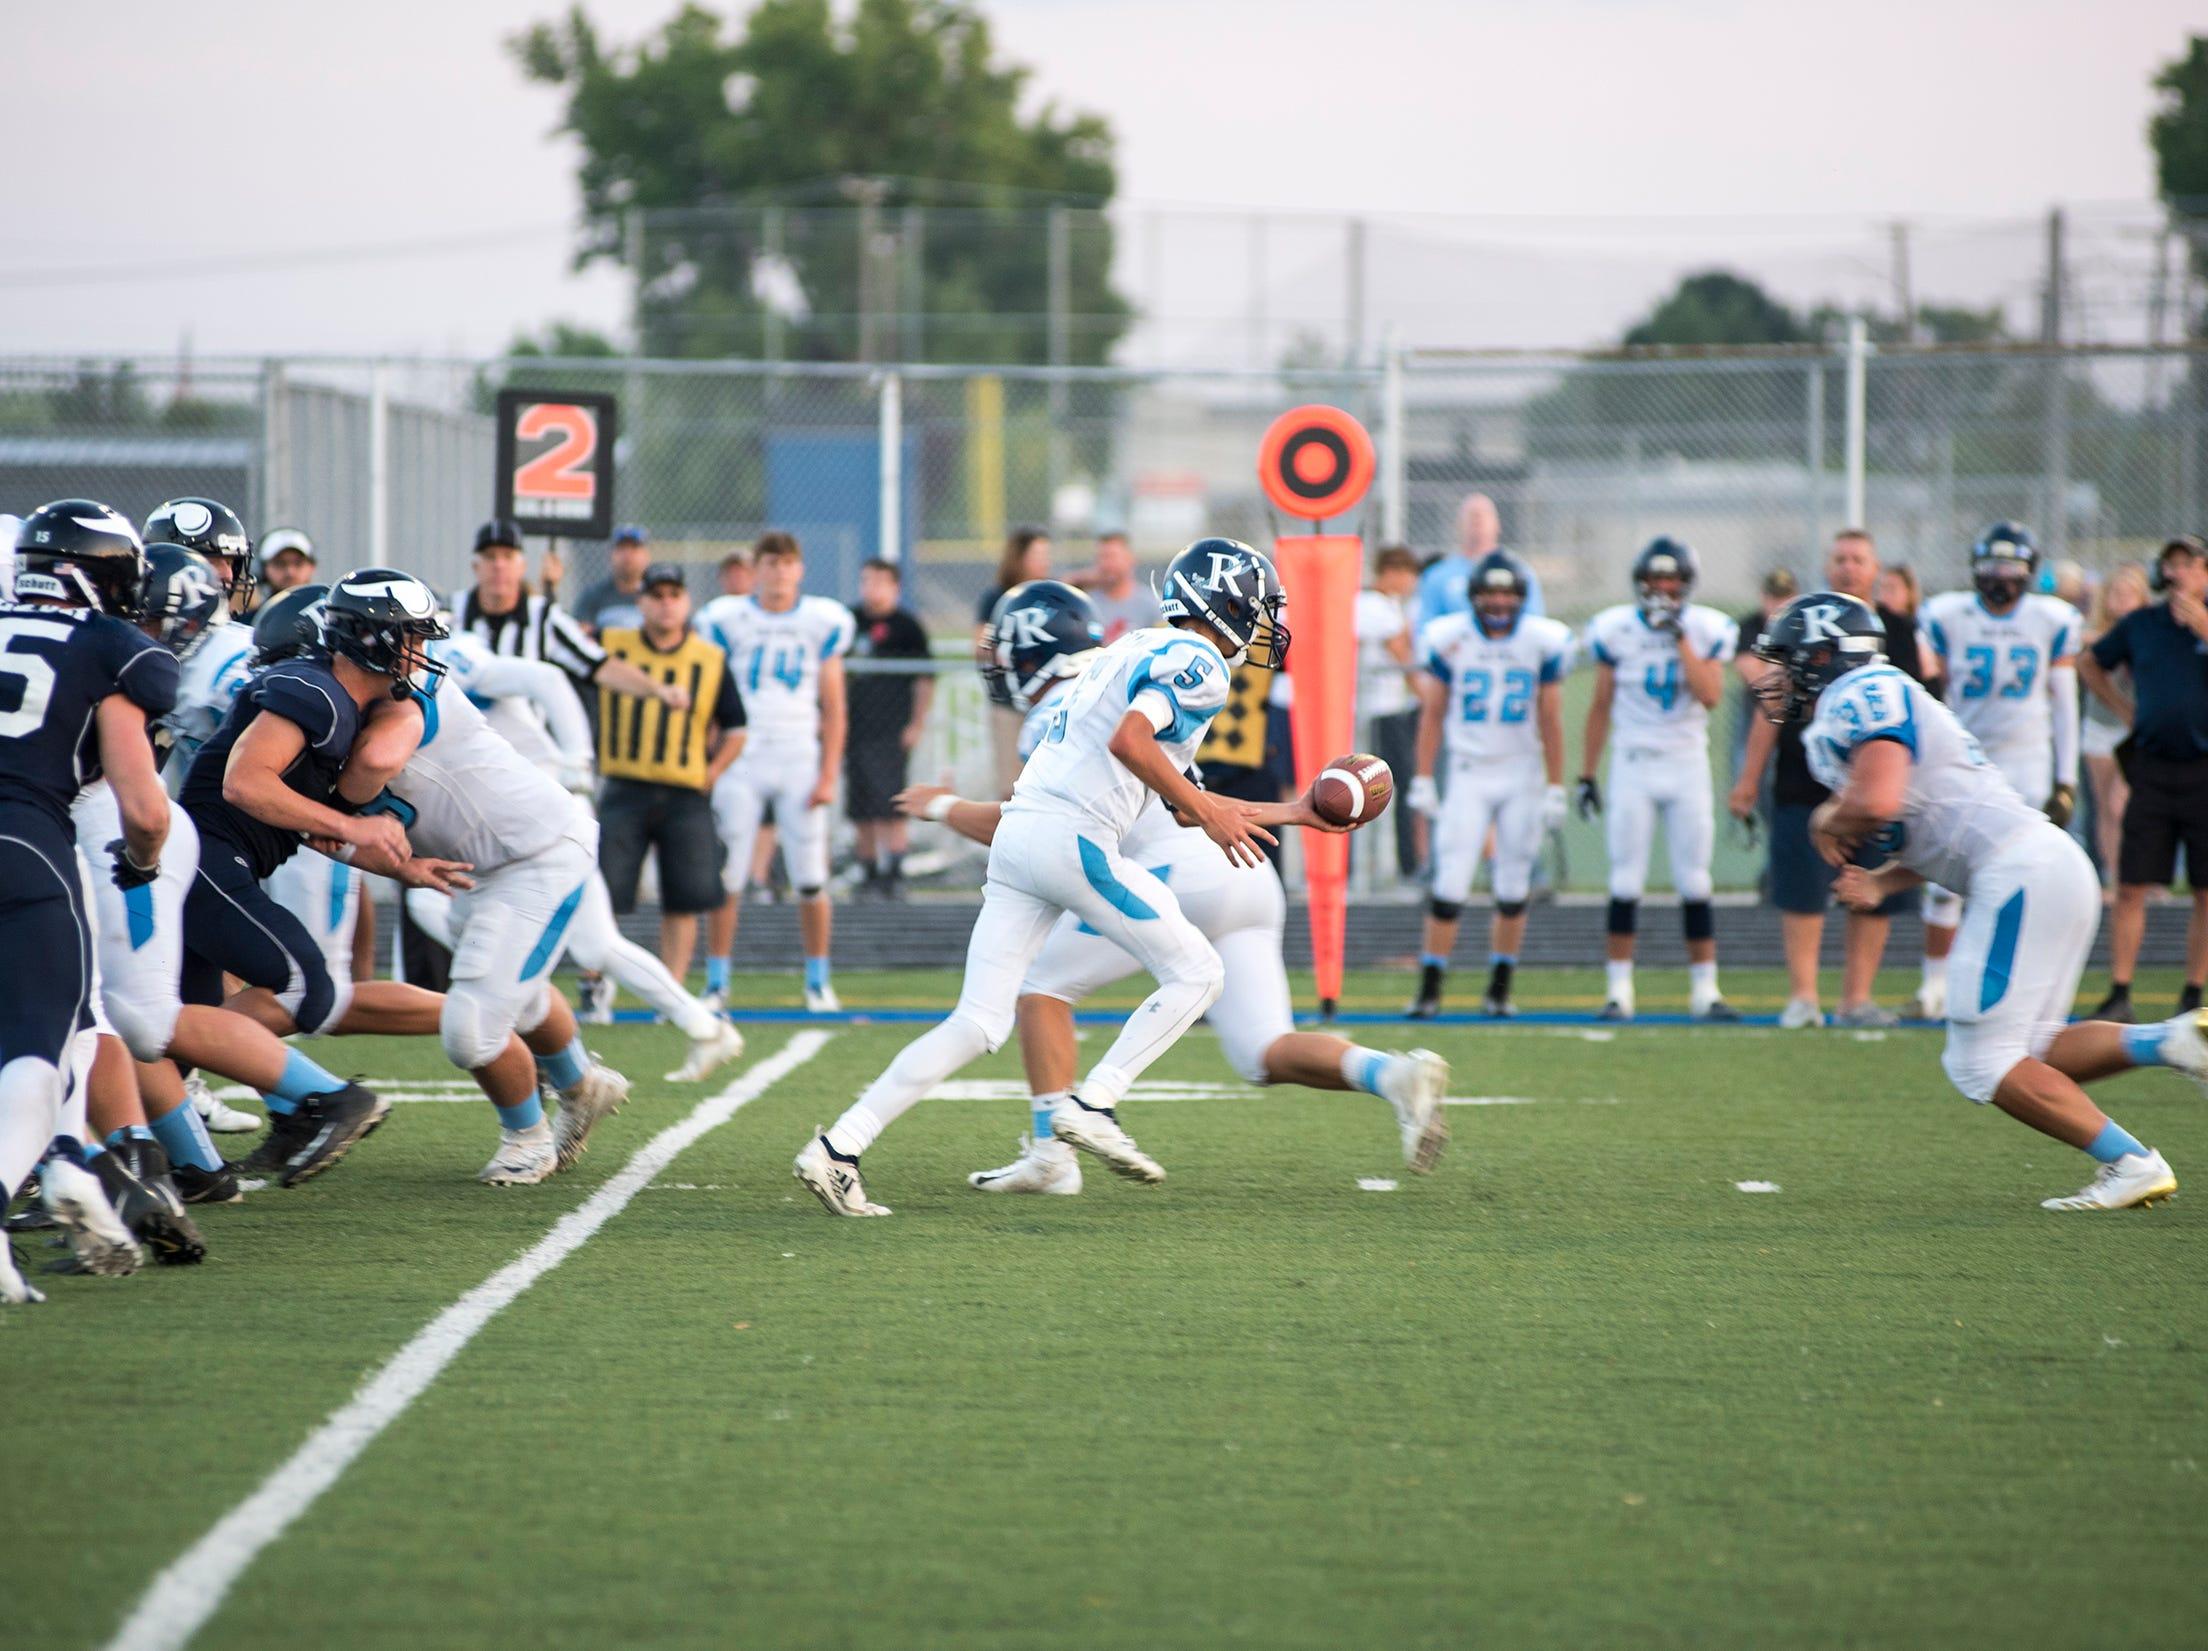 Richmond High School quarterback Brandon Schorman (5) hands off the ball to running back Noah Montanari during their game against Marysville Thursday, Aug. 23, 2018, at Marysville High School.